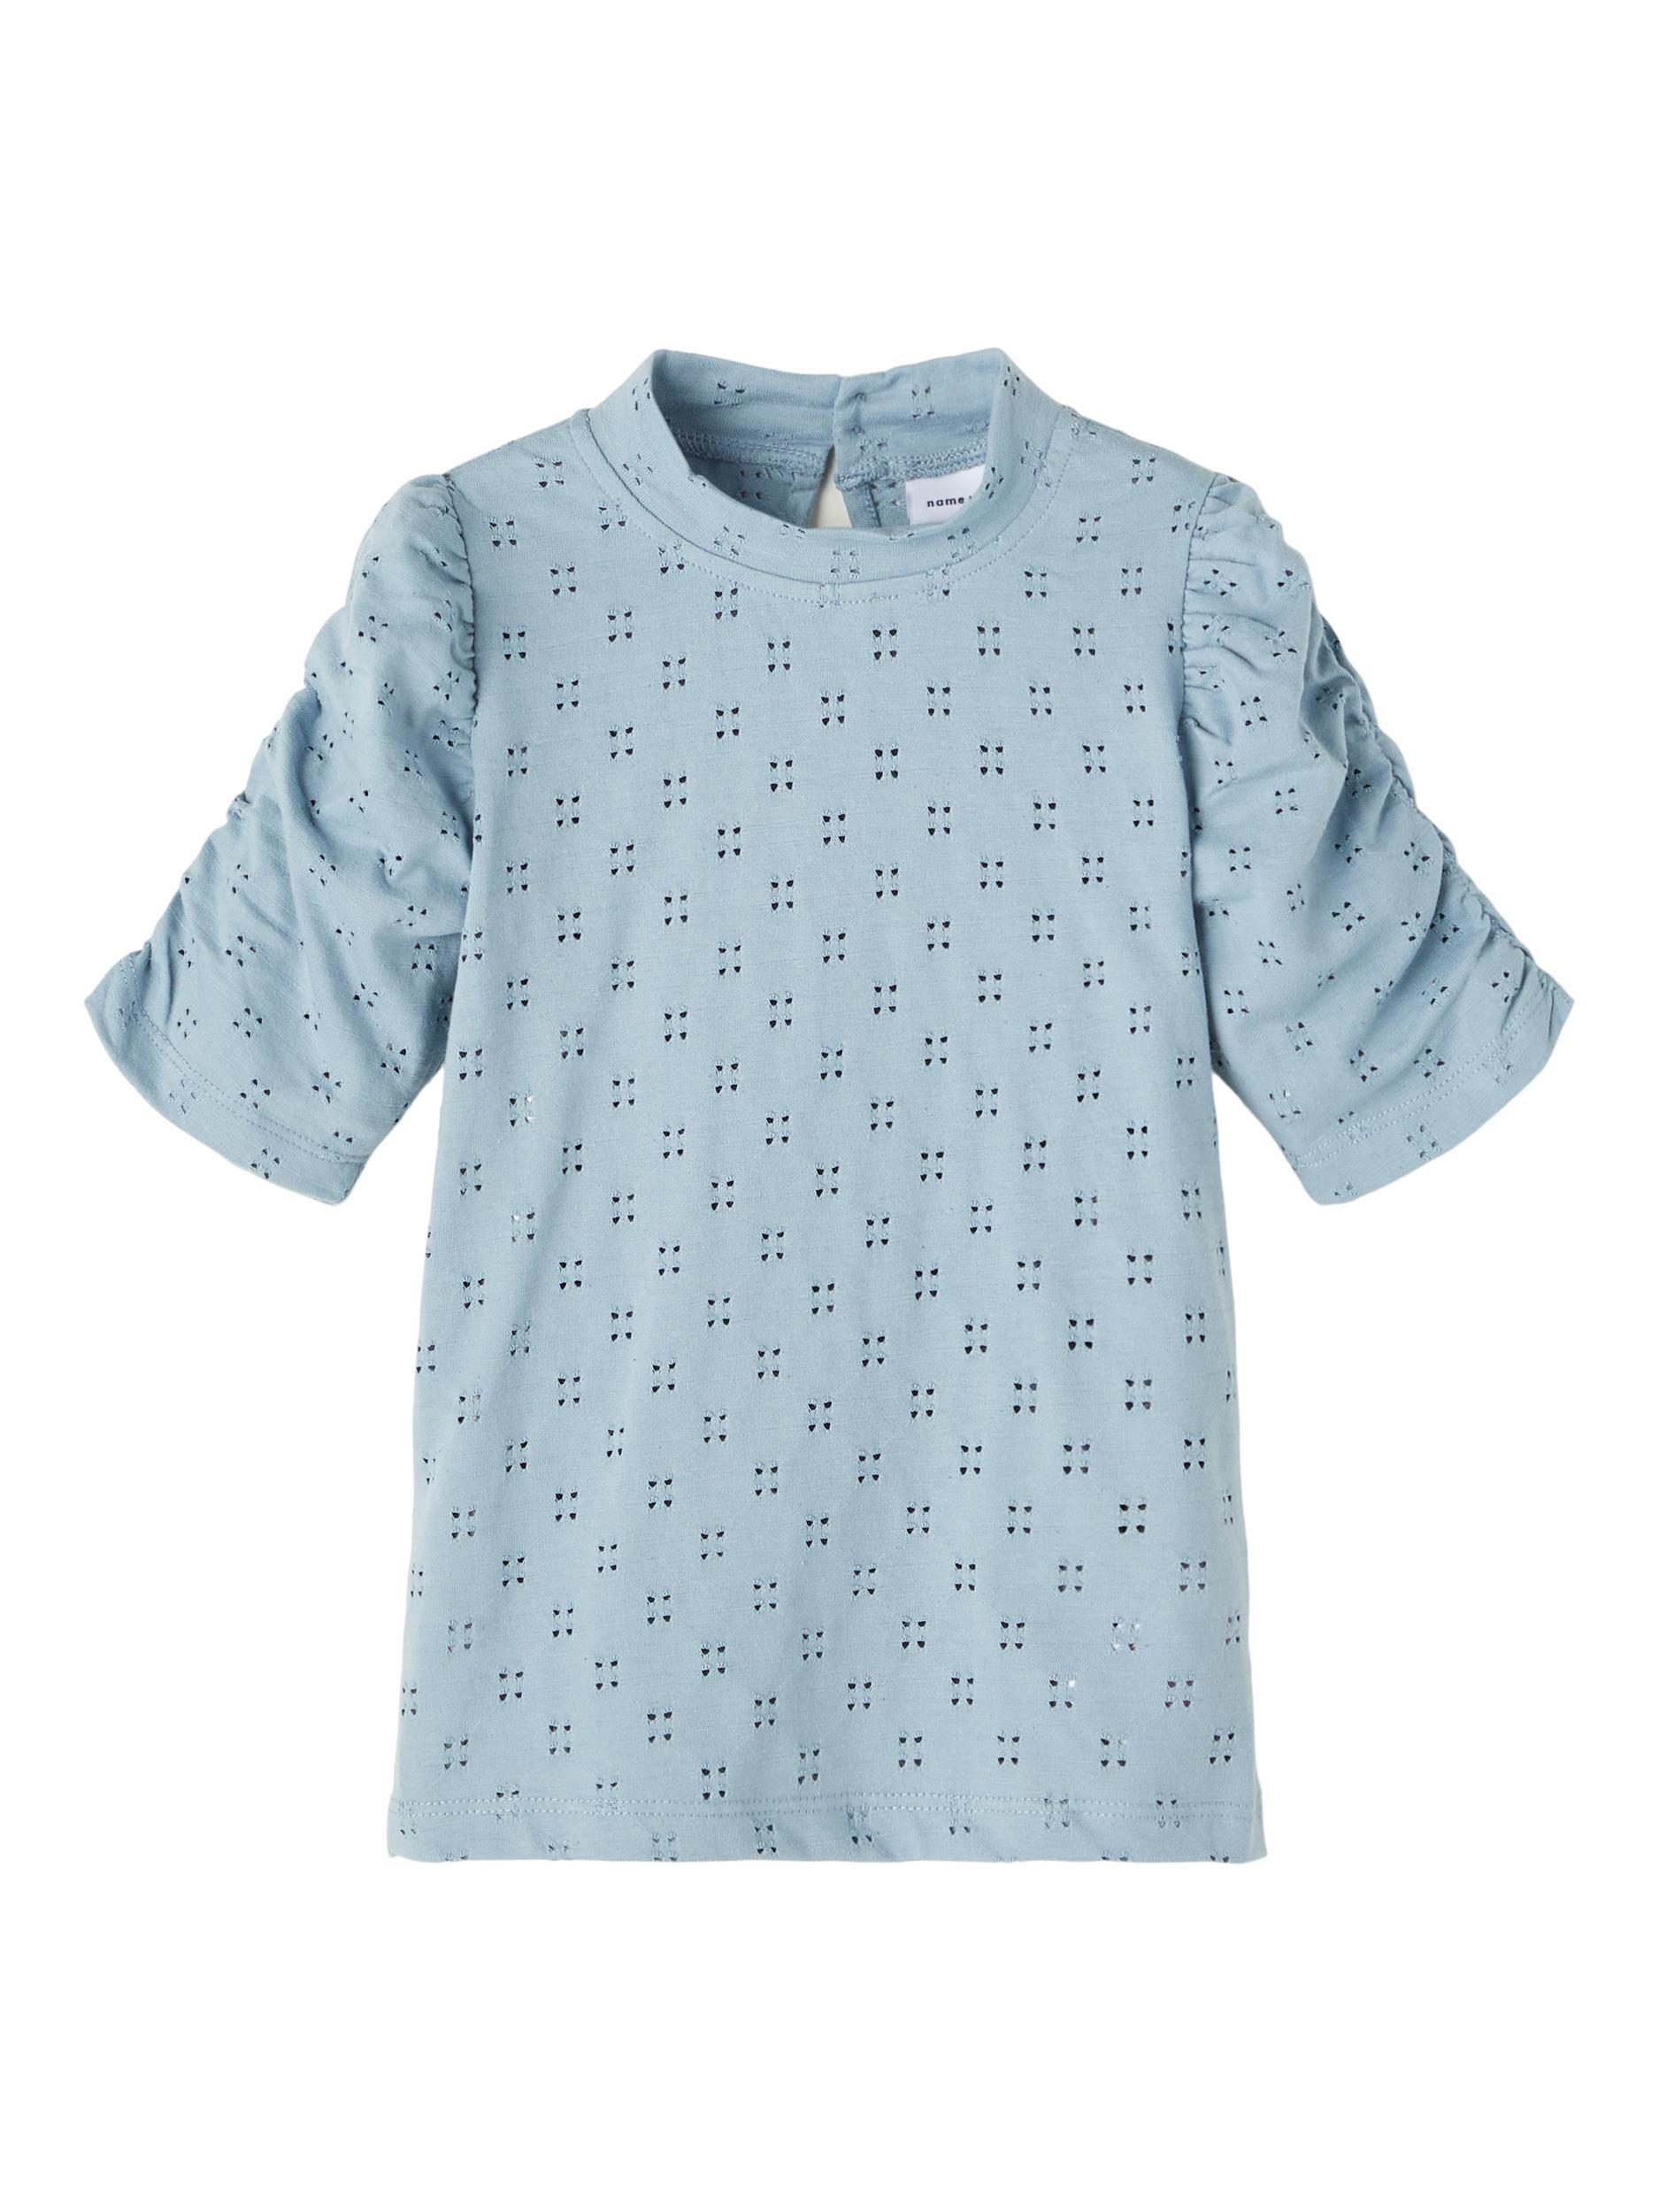 Name It Hafrun top, dusty blue, 146-152